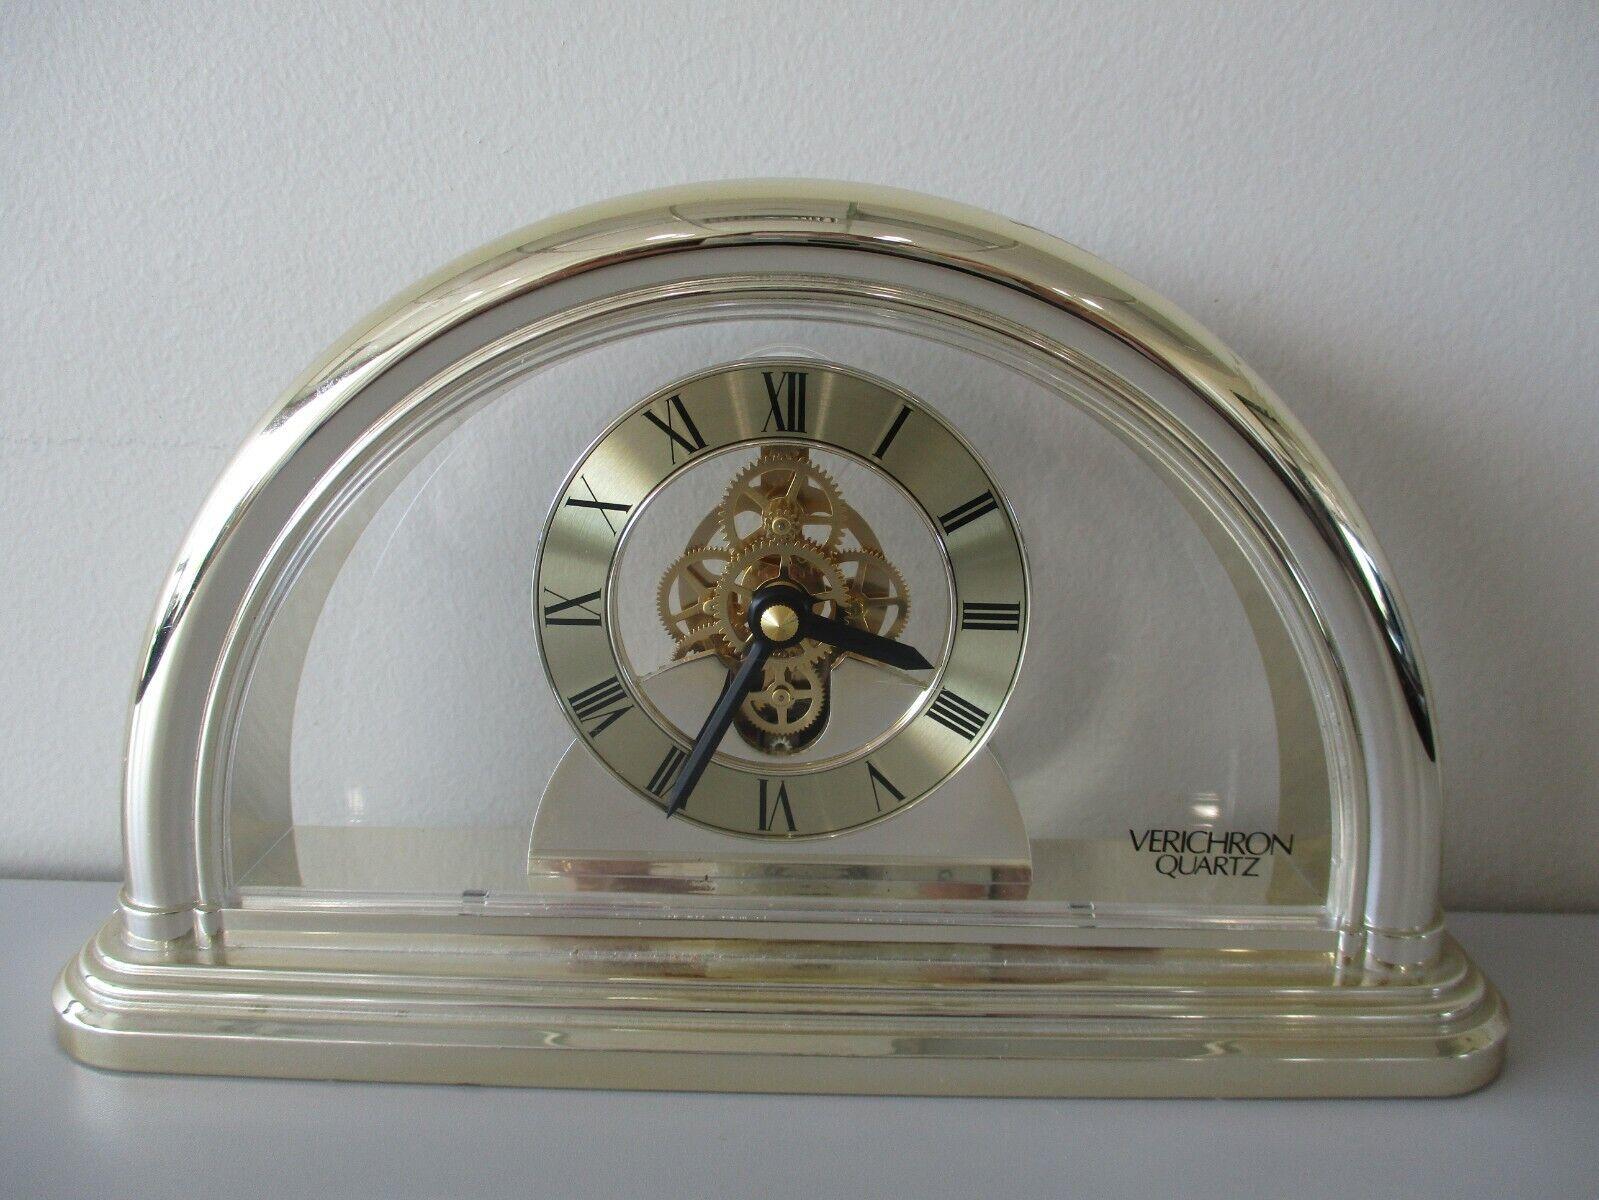 "Verichron Quartz Mantel Clock With Skeleton Movement 9.5"" X 5.5"" Gold Plastic"